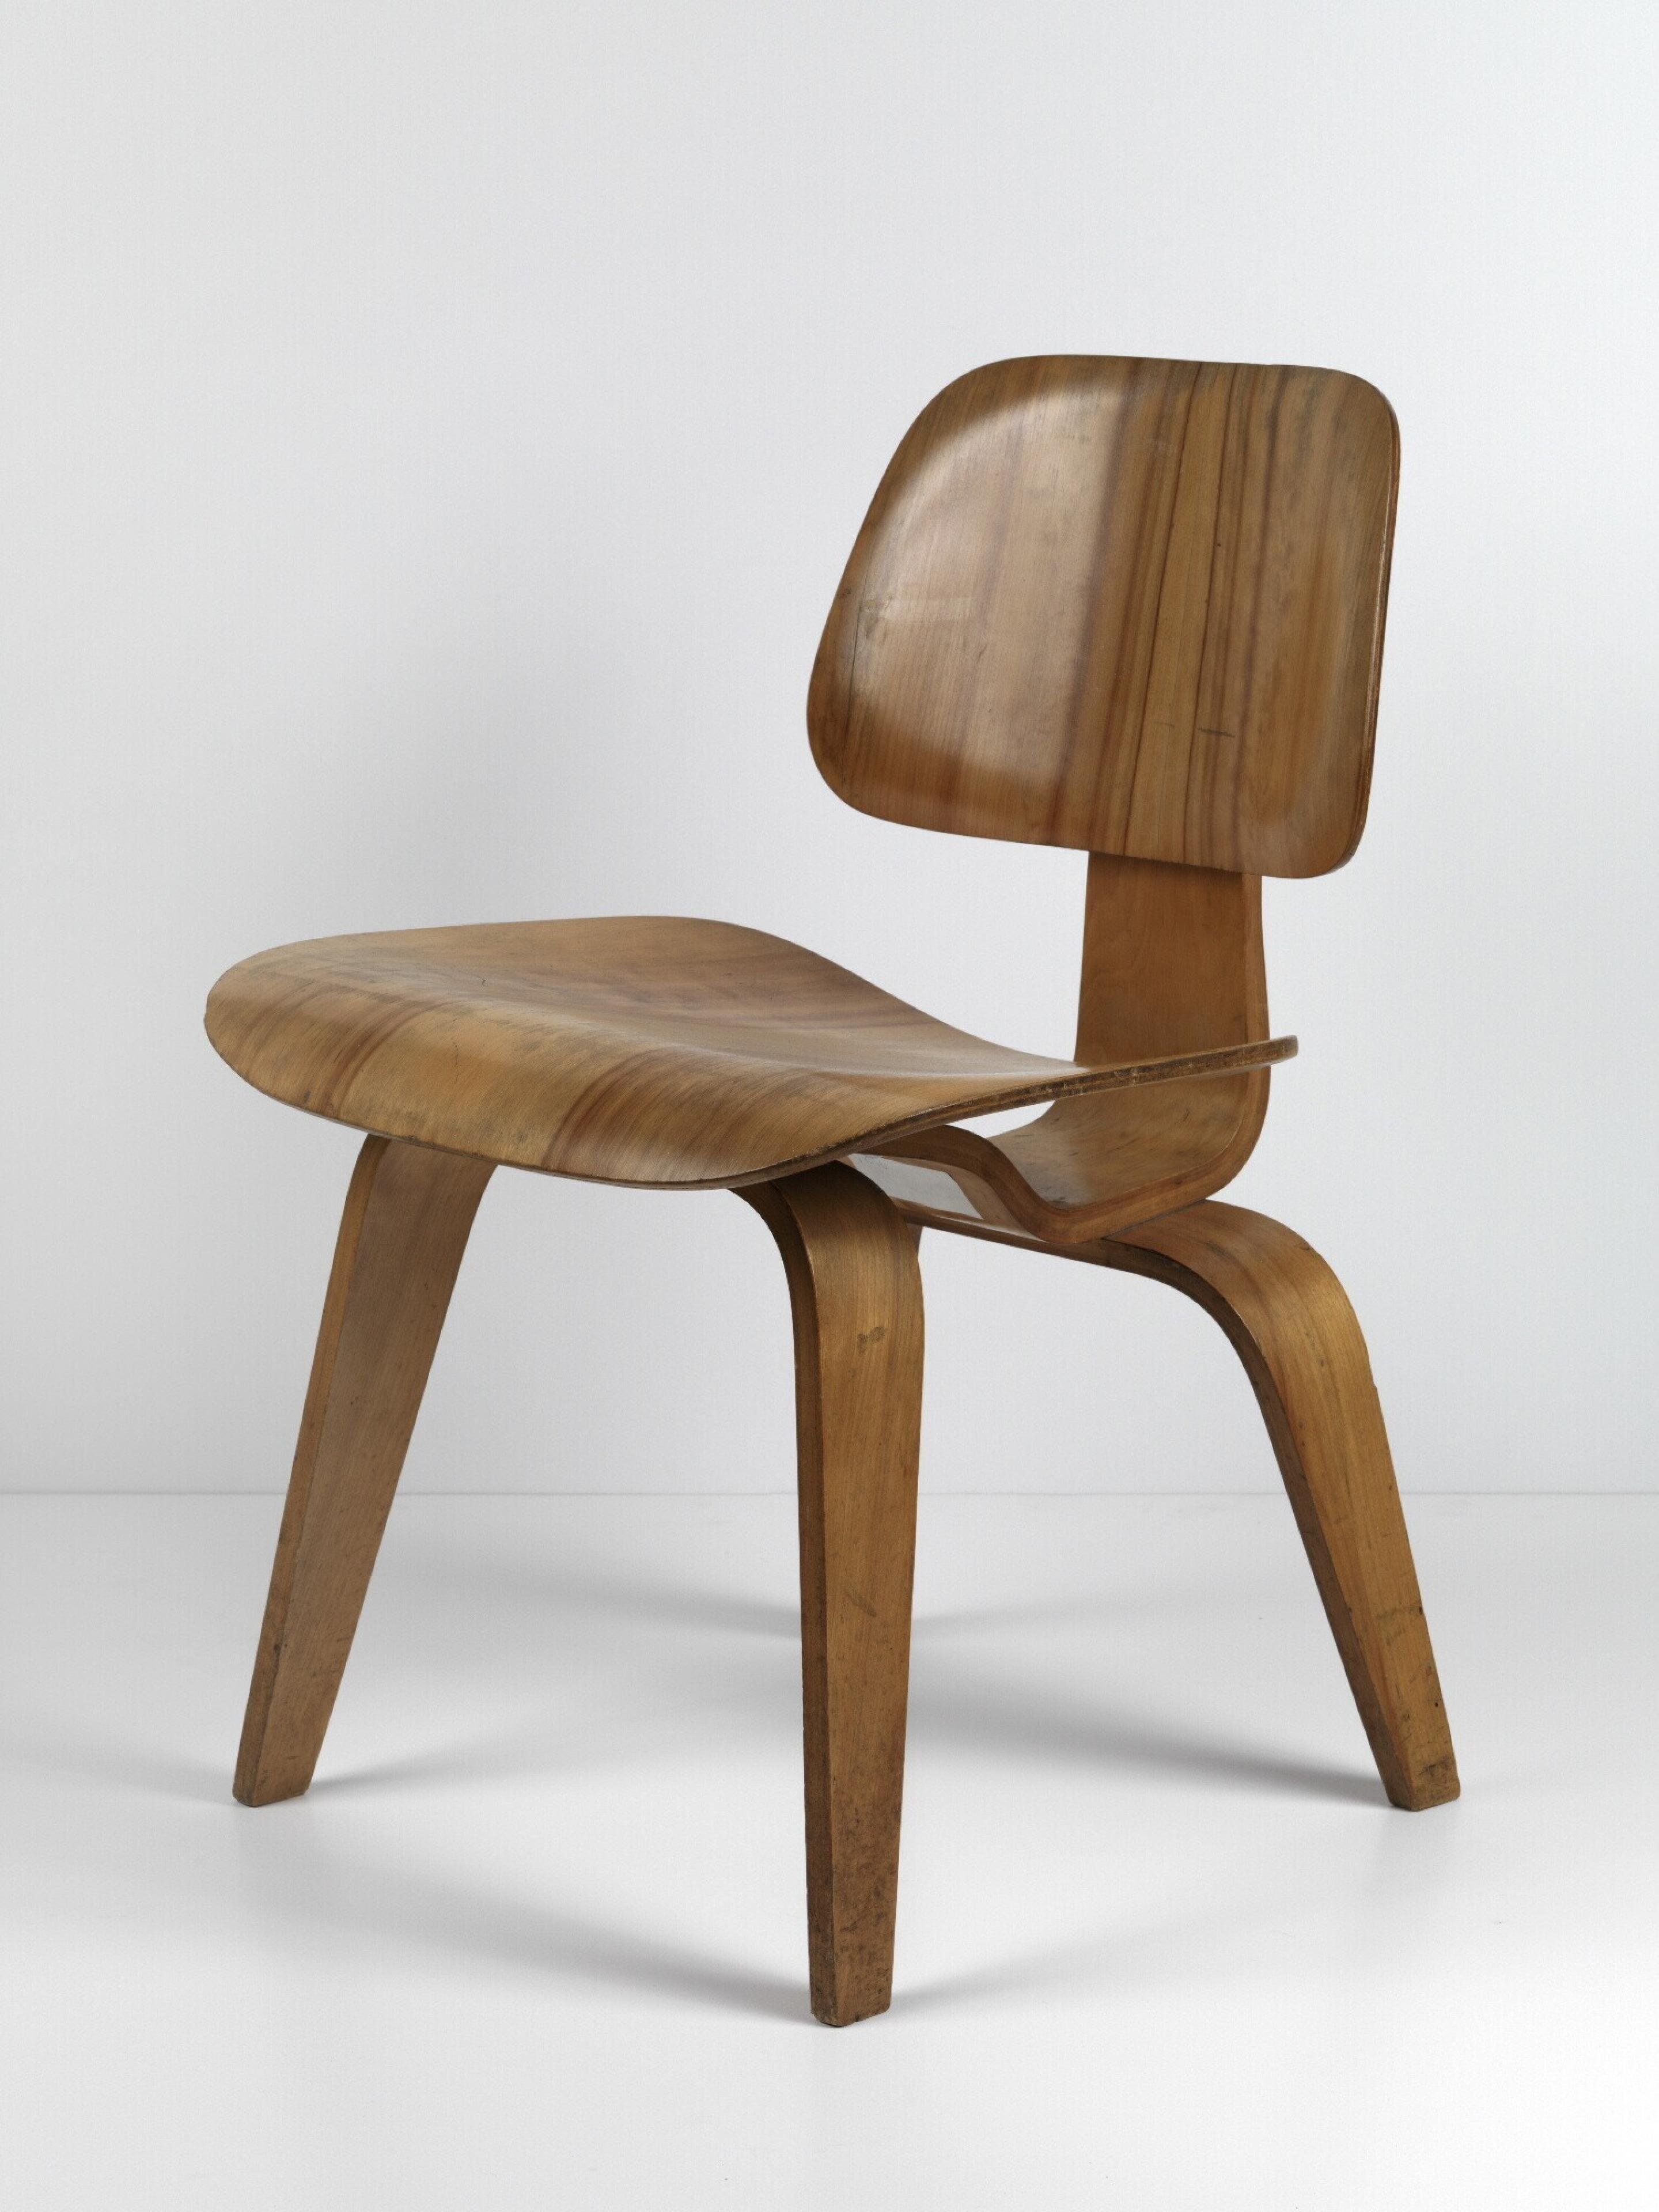 Lounge Stoel Eames.Charles Eames Museum Boijmans Van Beuningen